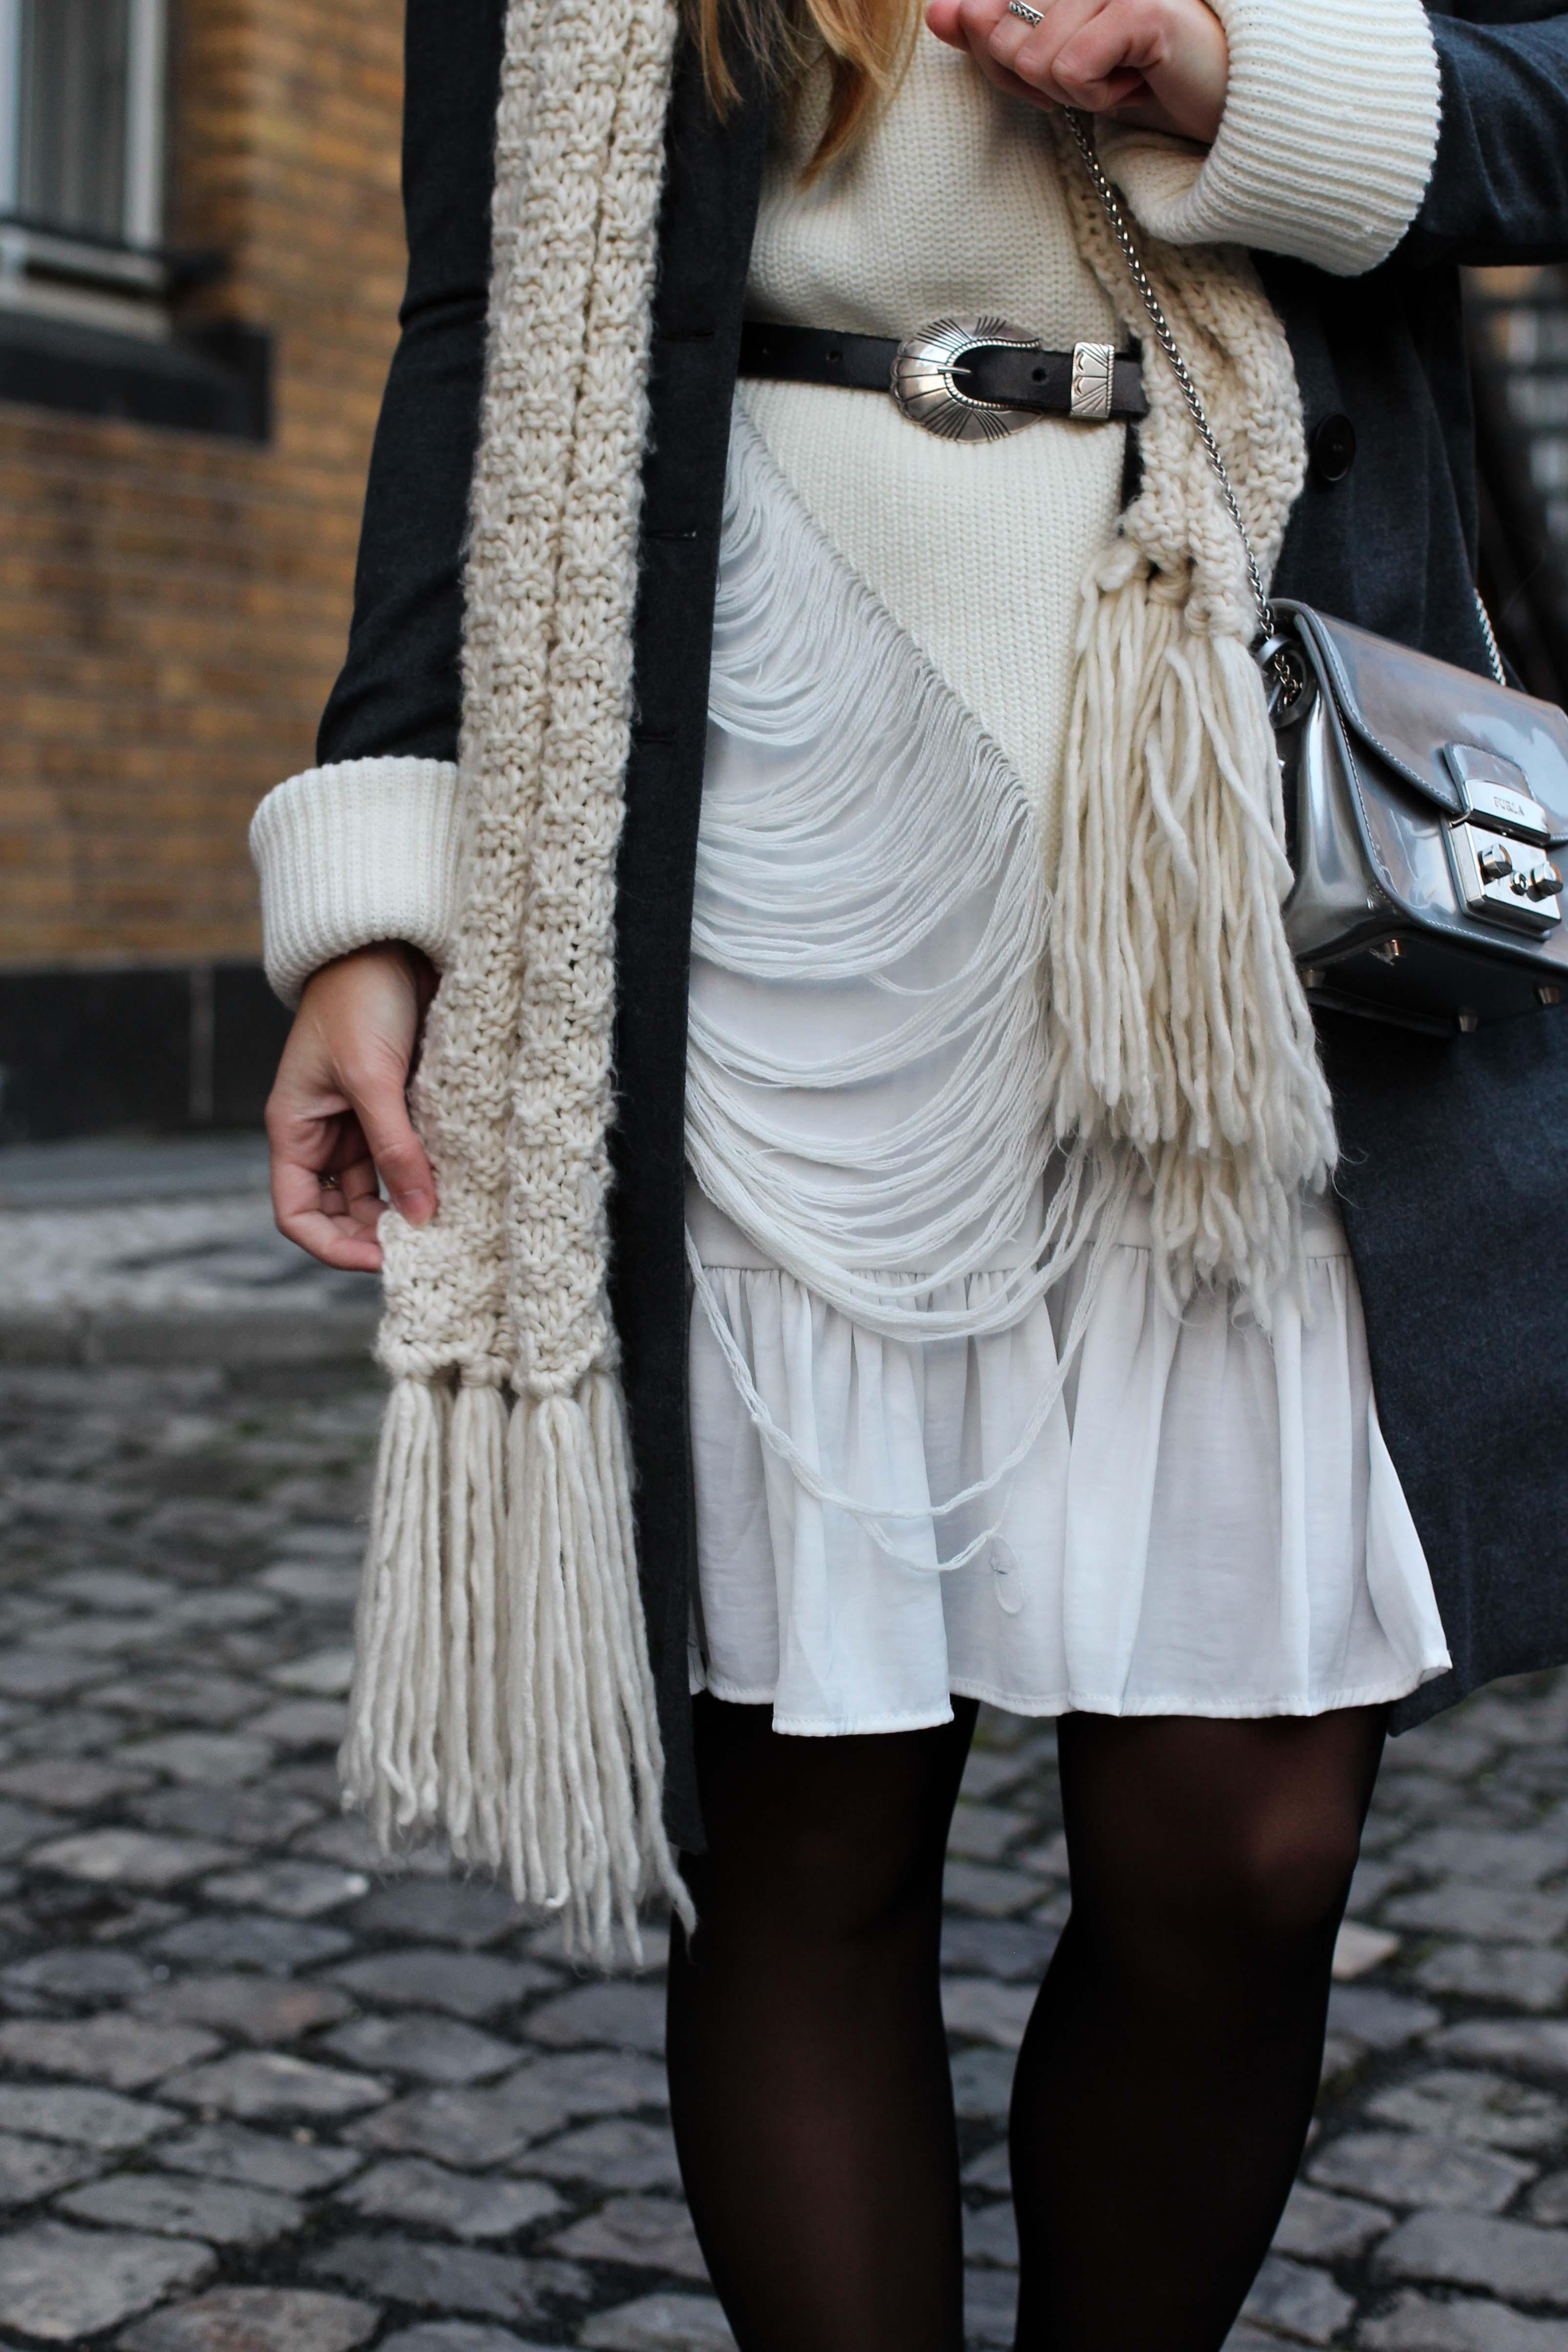 Winter-Layering weißes Kleid, Ripped Pullover Asos schwarze Strumpfhose Hunkemöller kombinieren Outfit Modeblog bonn 2